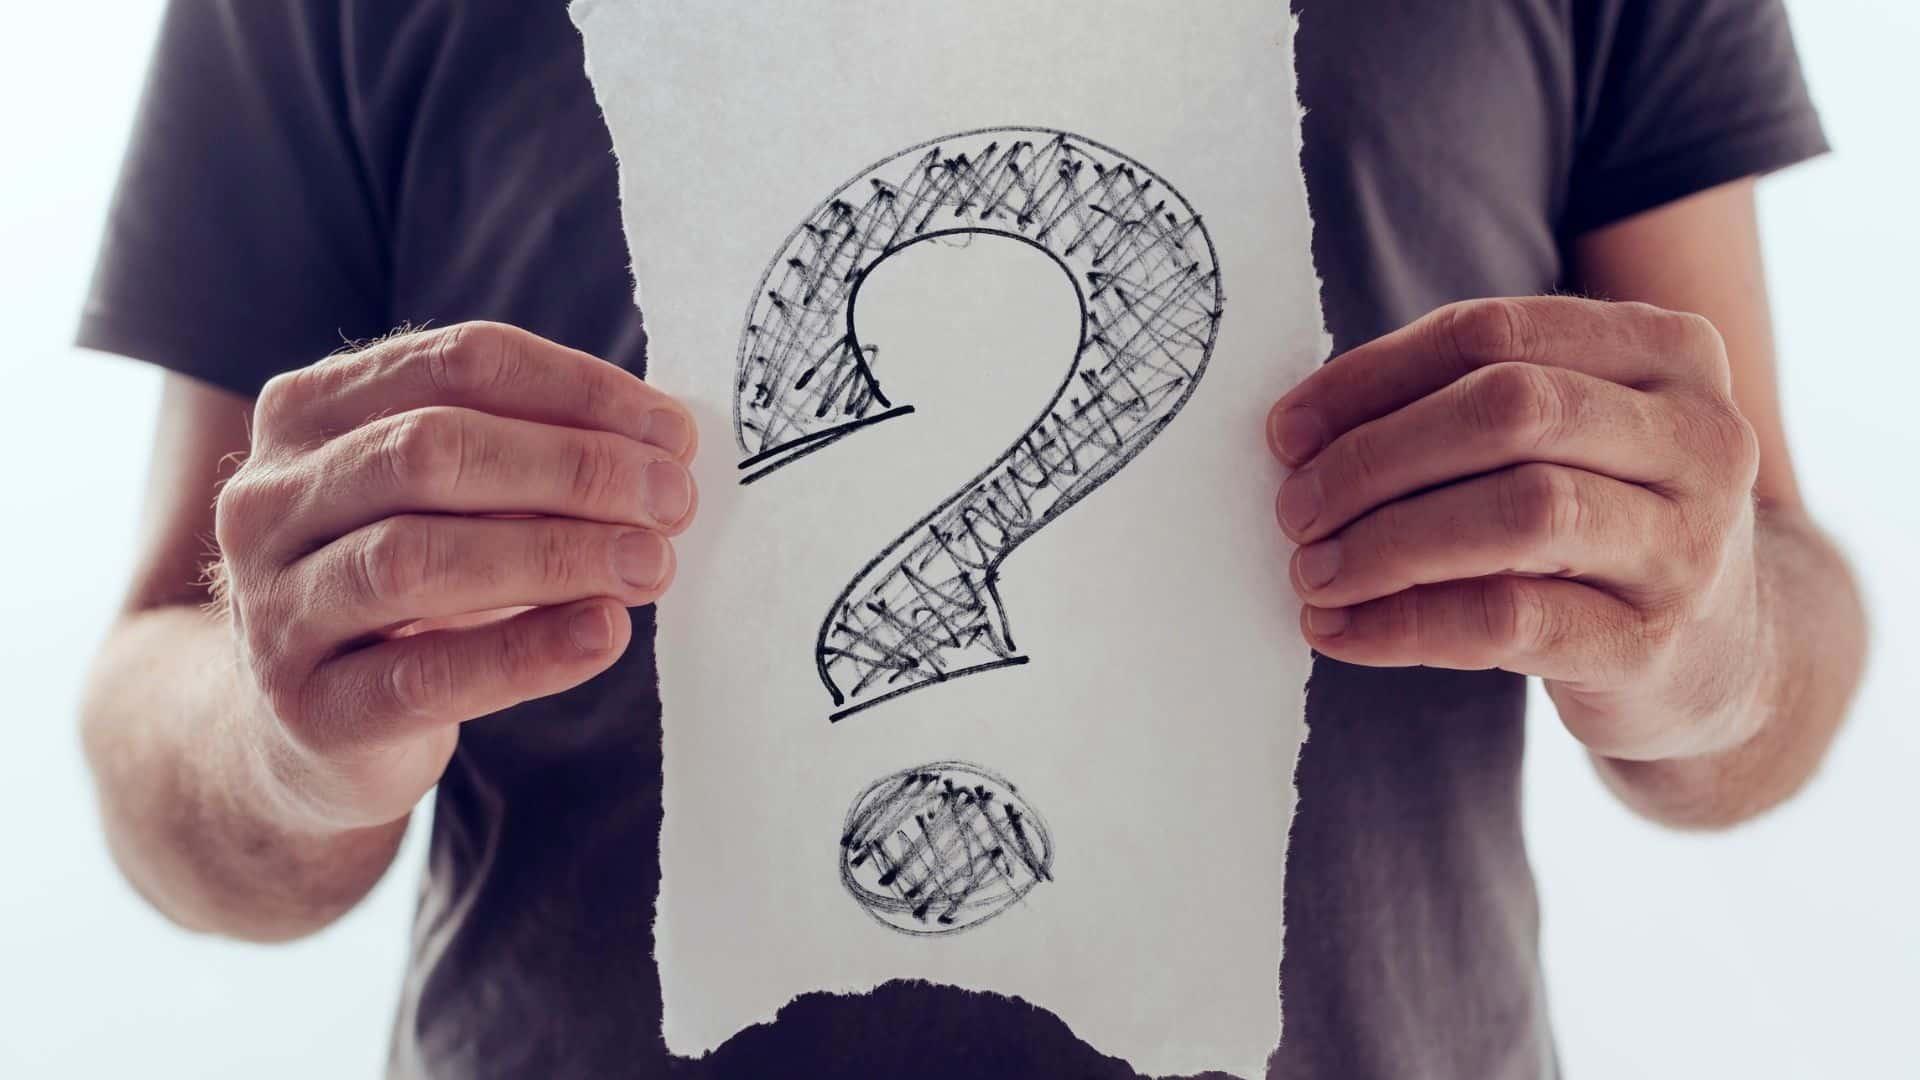 Comment manager dans l'incertitude ?